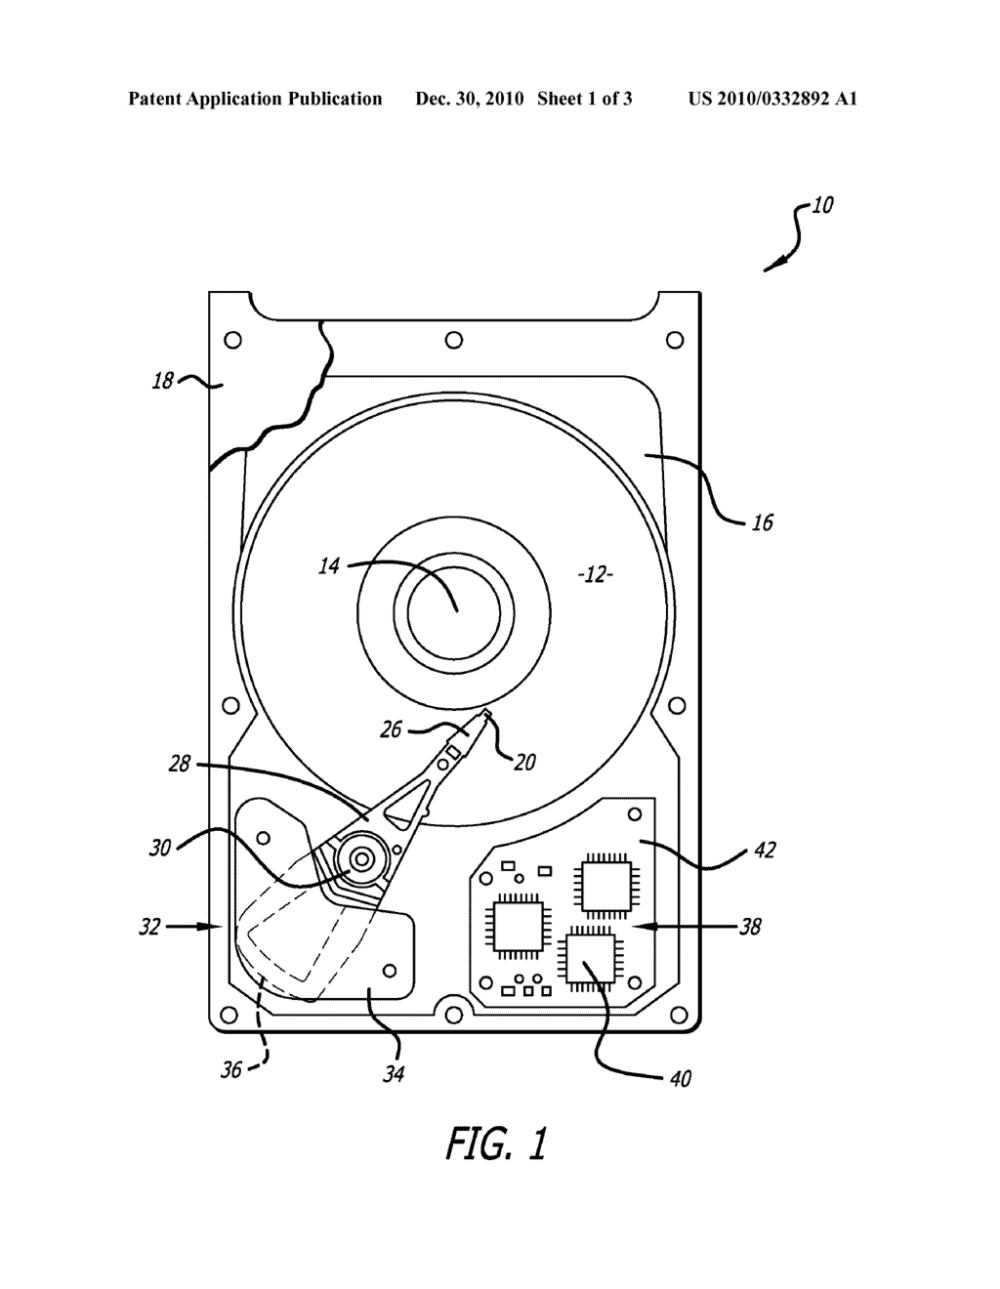 medium resolution of disk drive diagram wiring diagram schematics disk drive sketch disk drive diagram